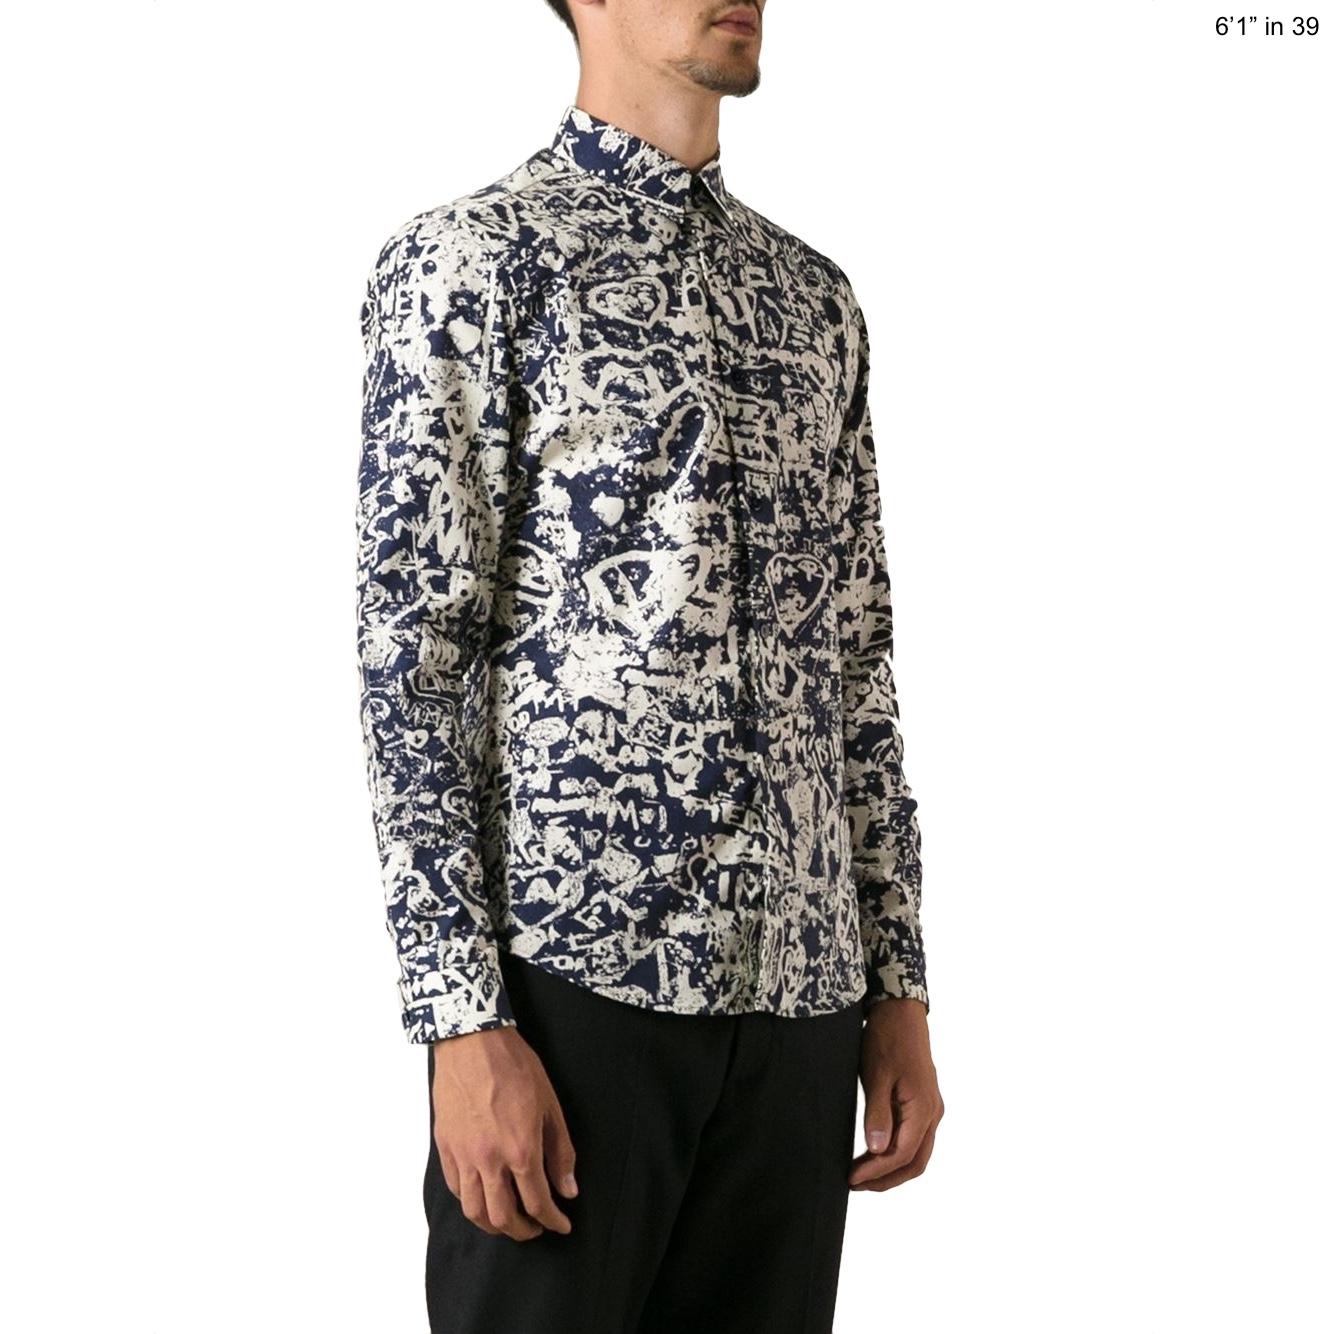 carven-blue-graffiti-print-shirt-product-1-22473397-1-071783841-normal.jpg